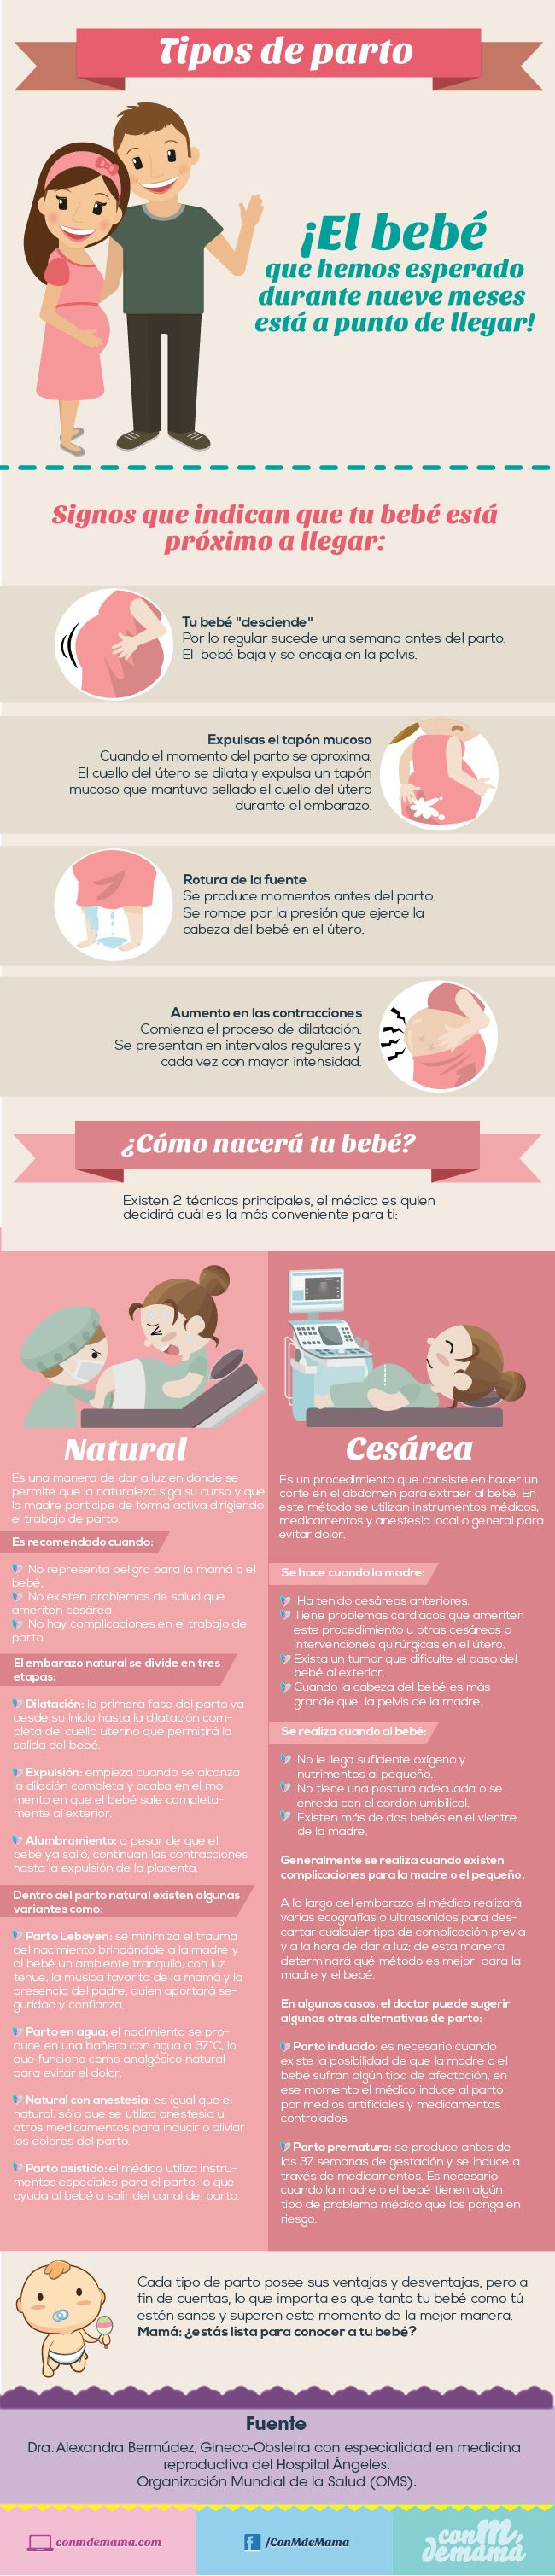 Tipos de parto http://conmdemama.com